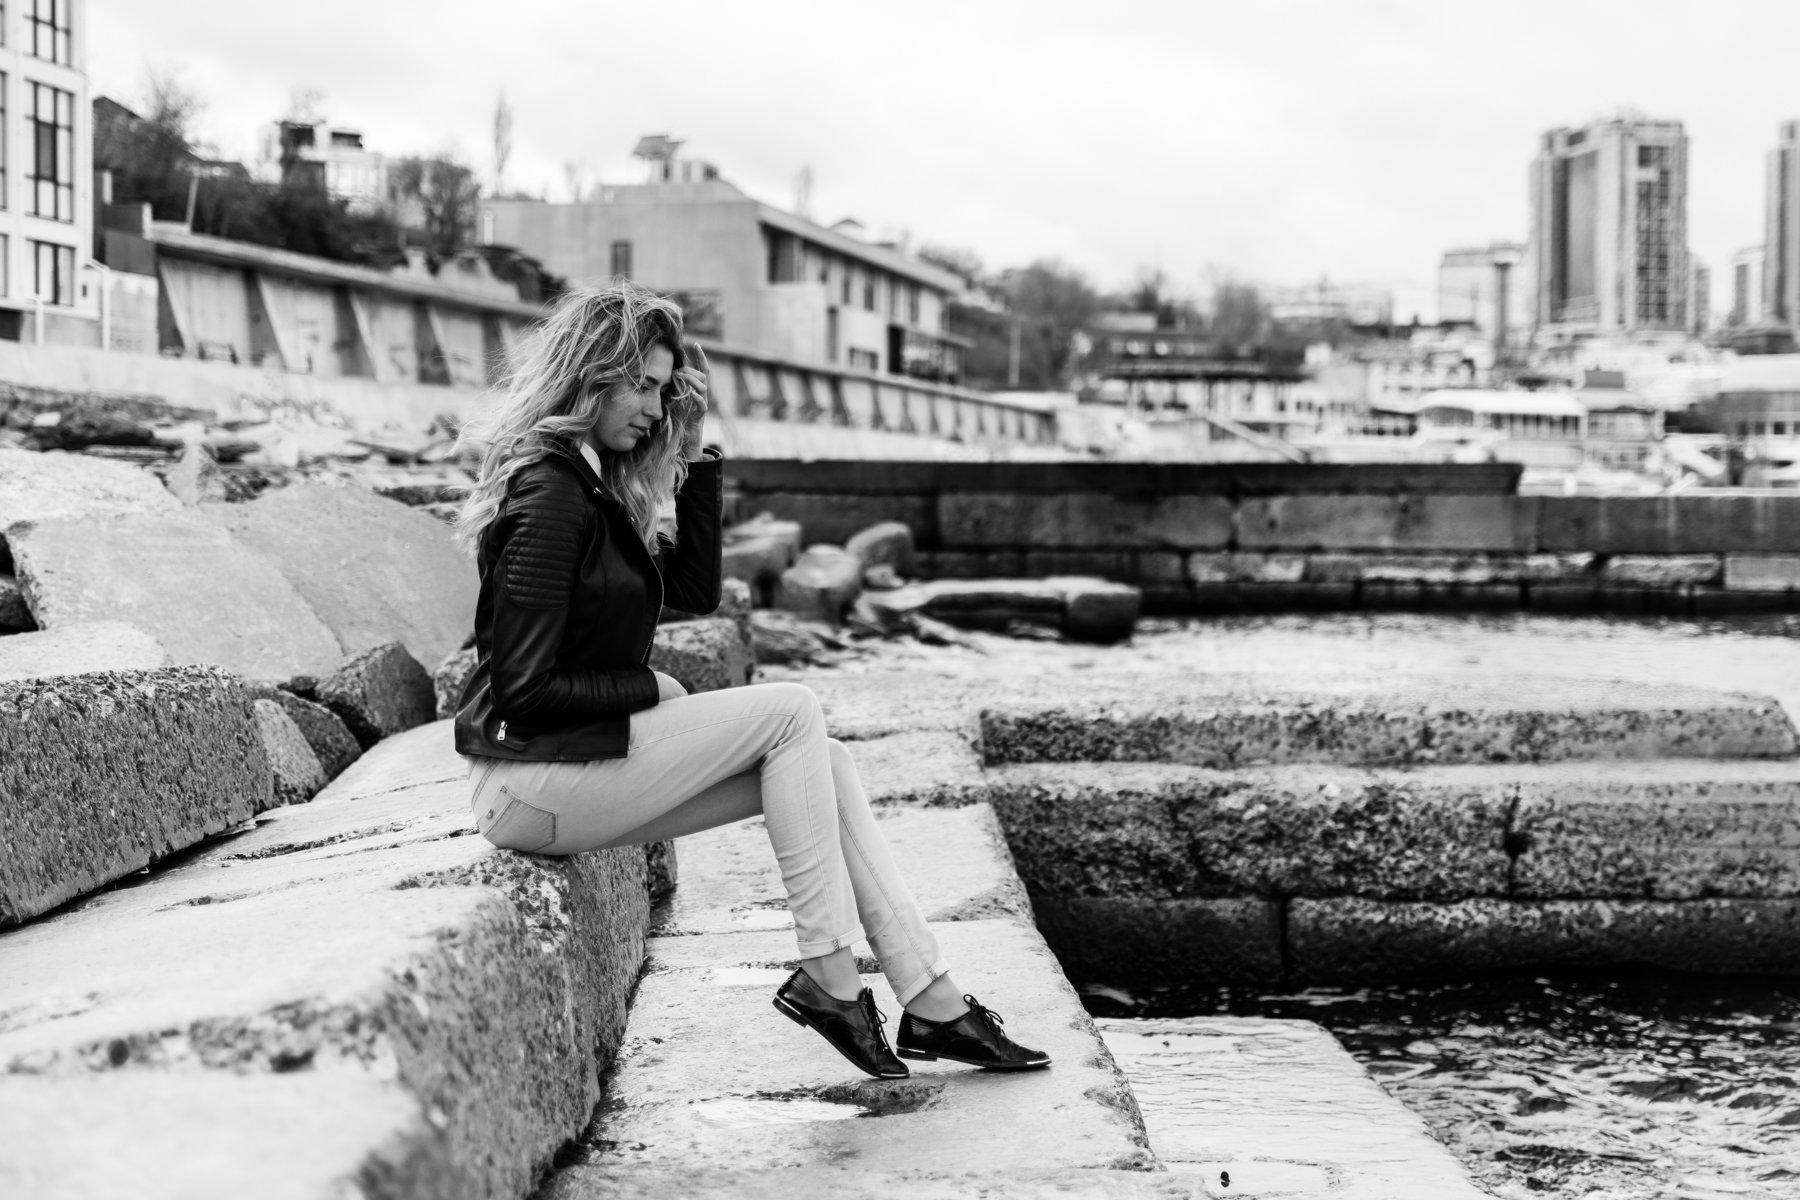 портрет, весна, море, одесса, девушка, Гозун Радослав